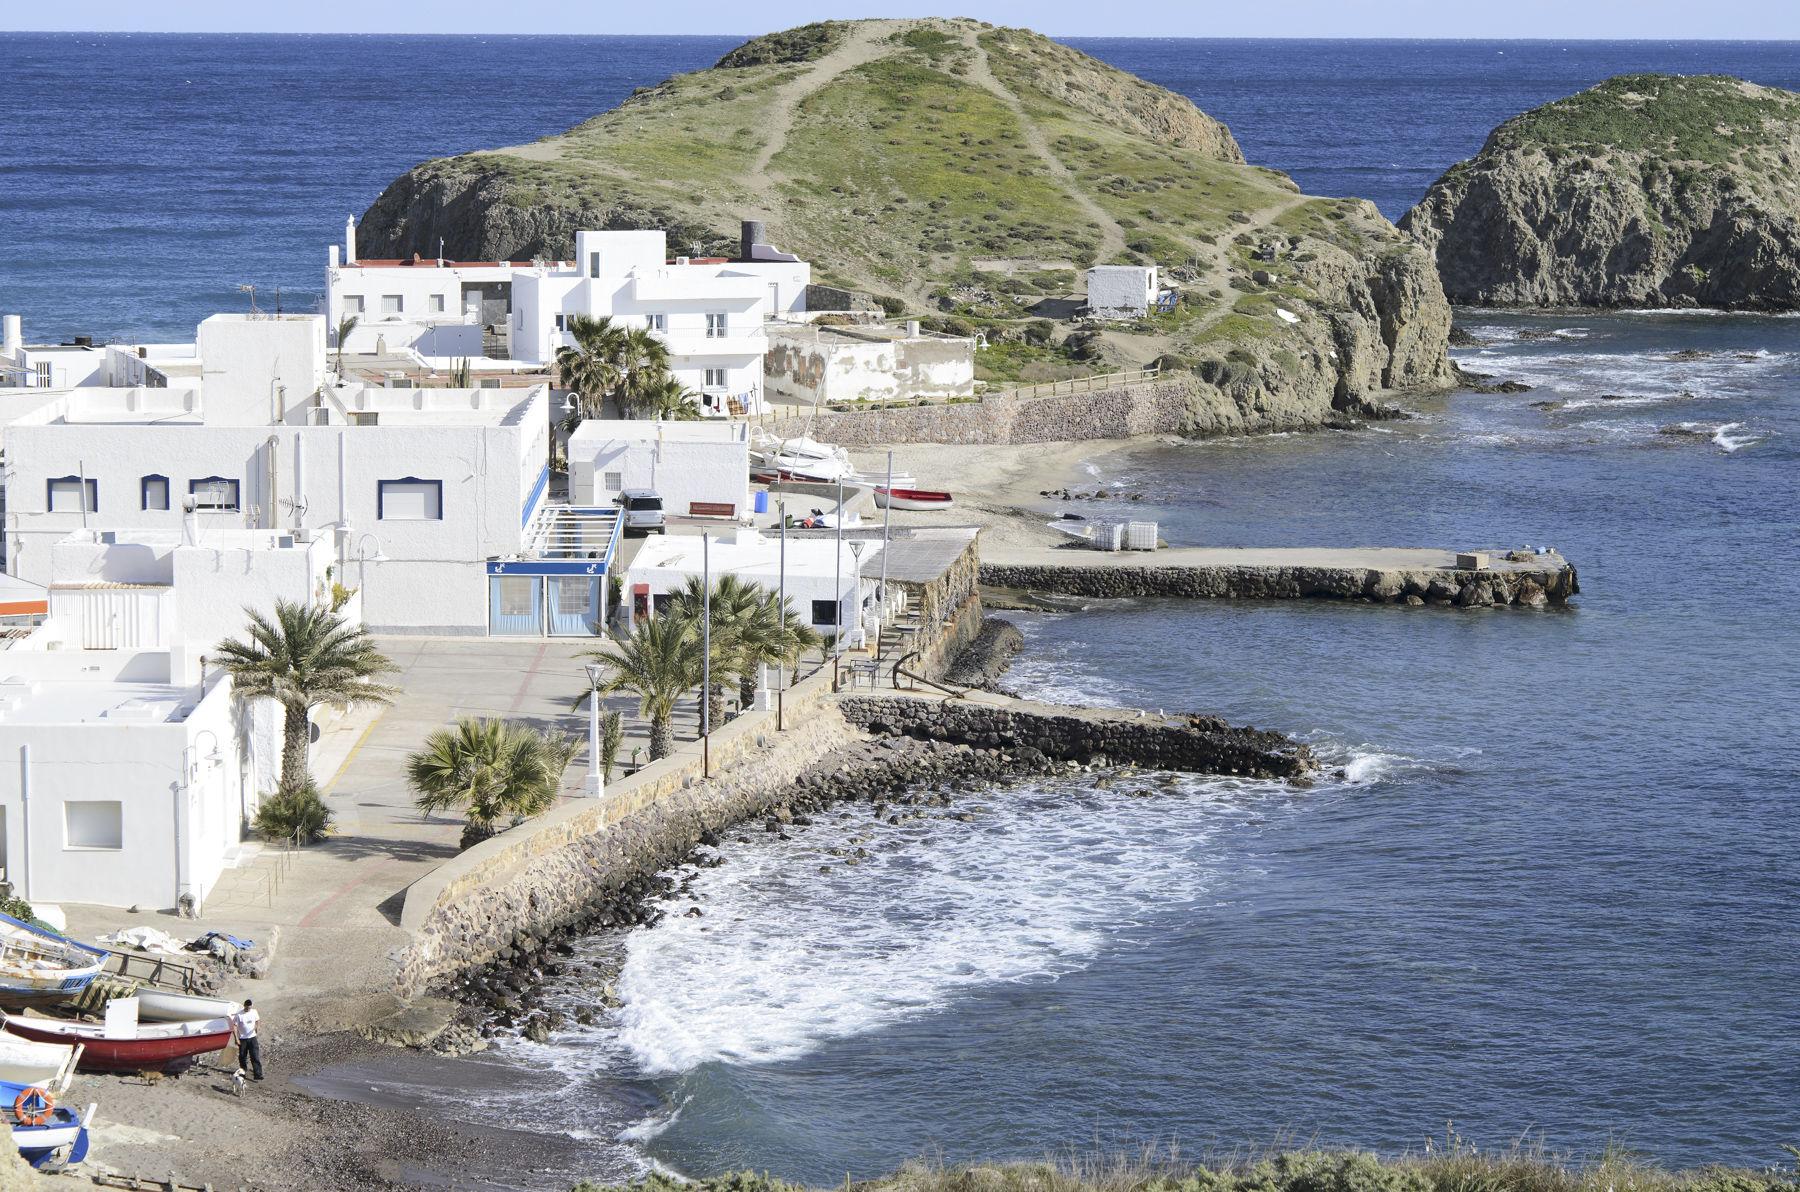 Playas de cabo de gata en almer a for Inmobiliarias de almeria